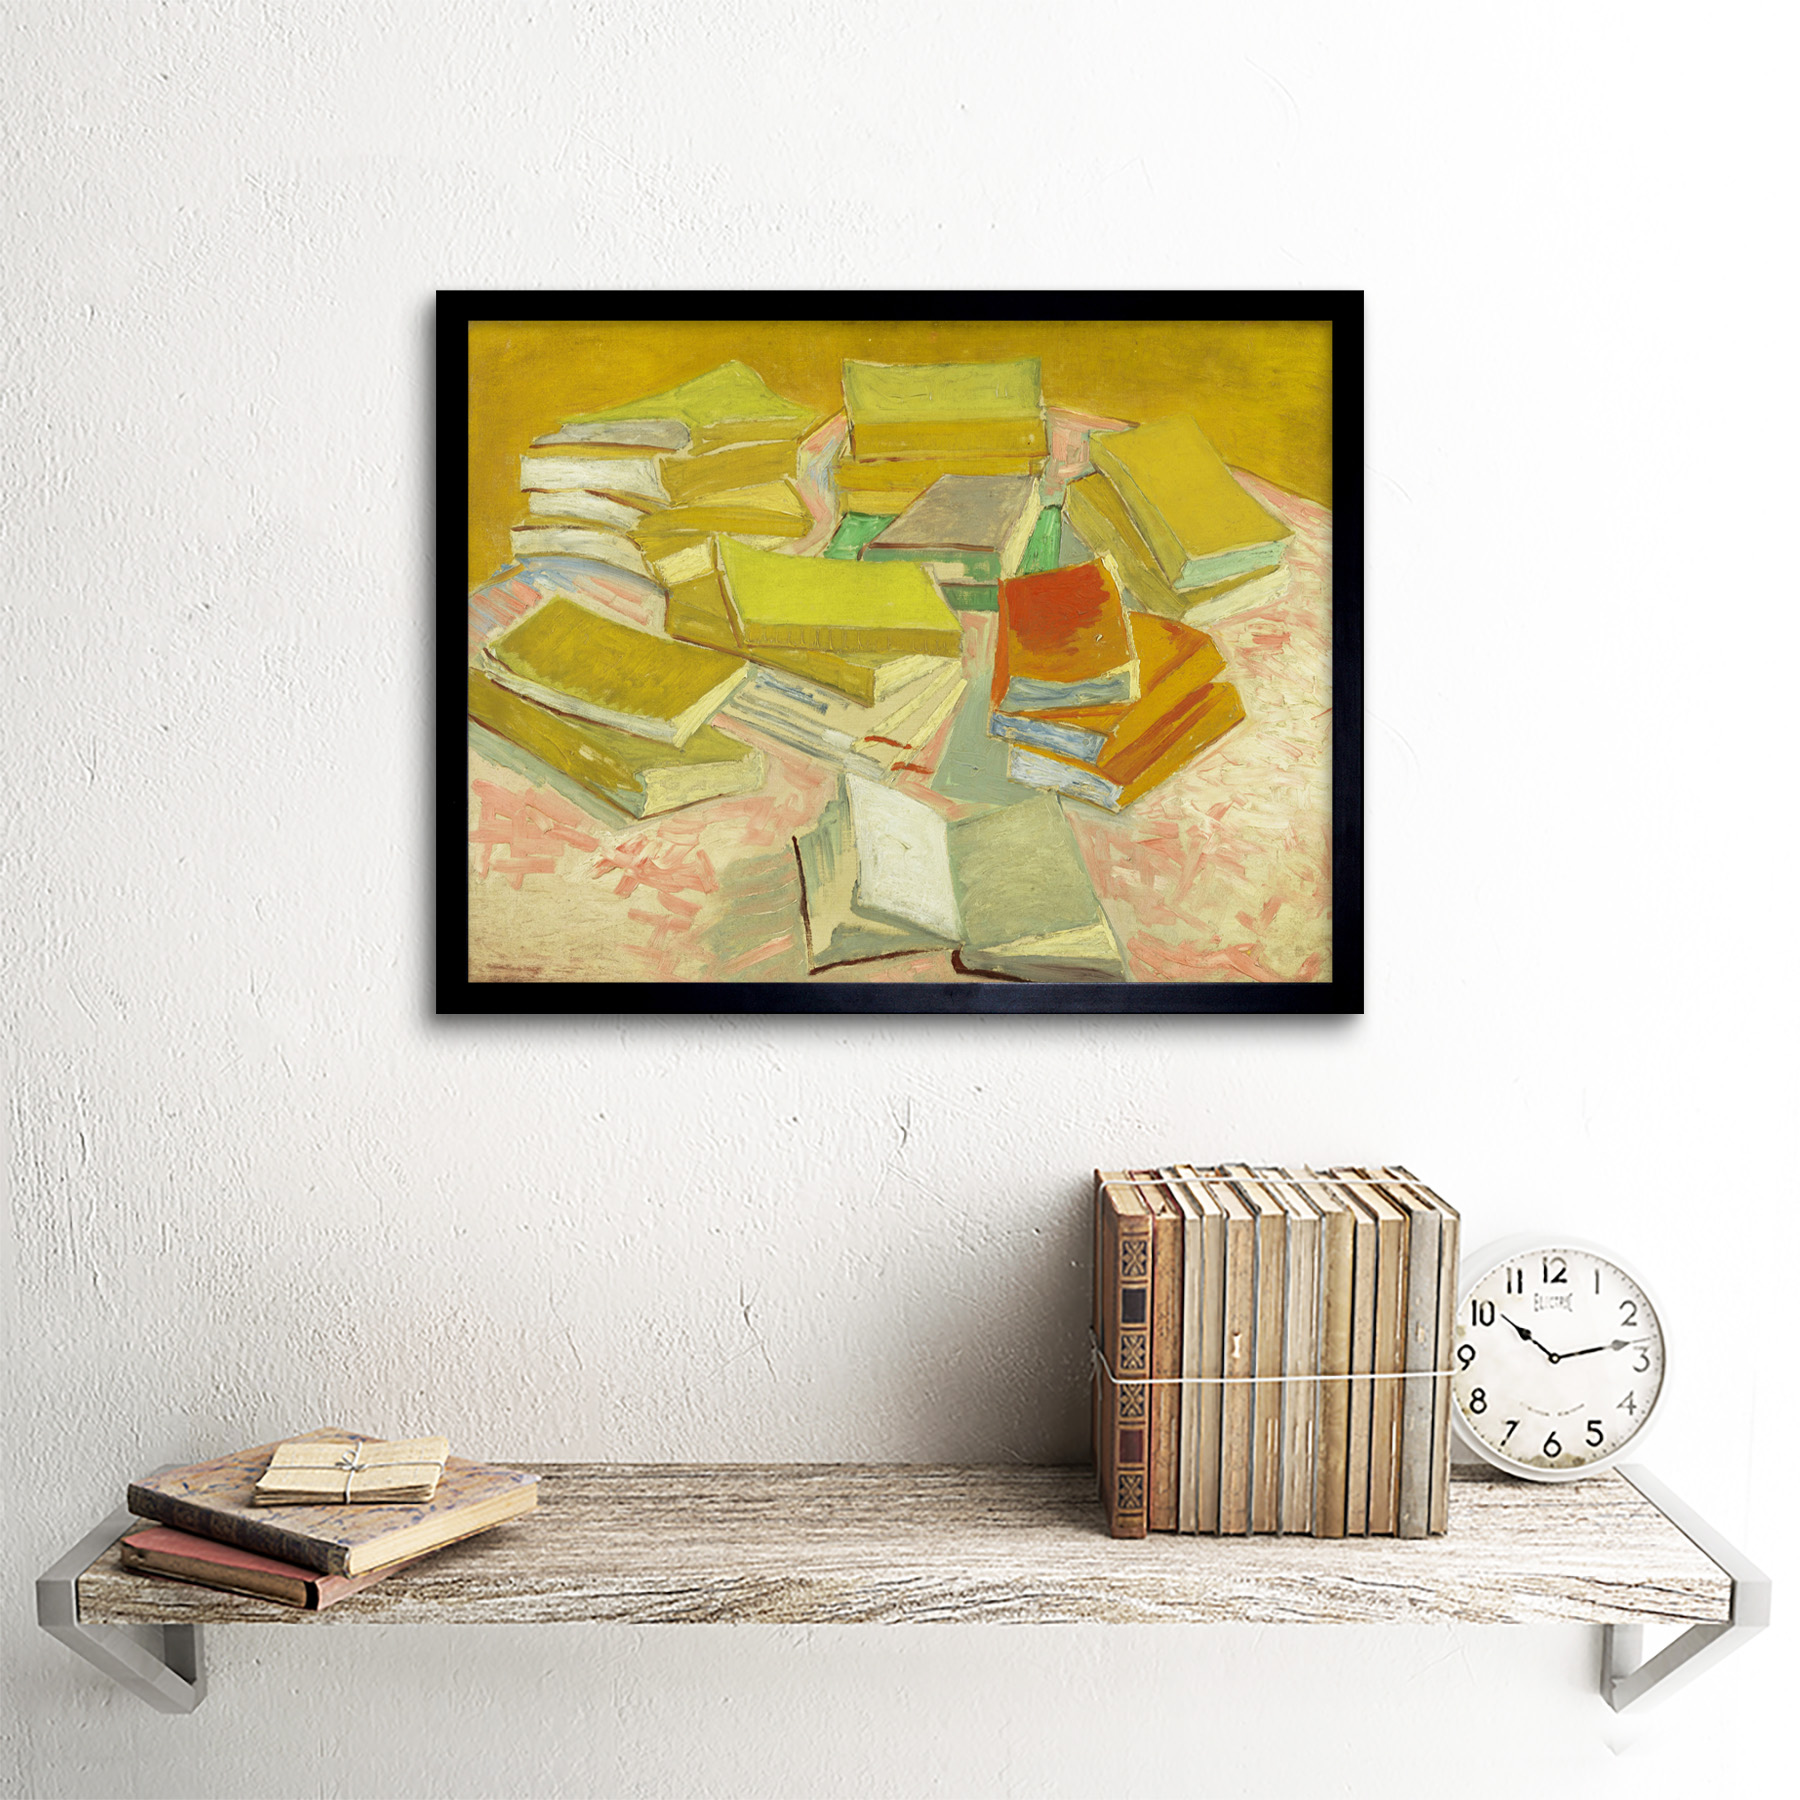 thumbnail 3 - Vincent-Van-Gogh-Piles-Of-French-Novels-Art-Print-Framed-12x16